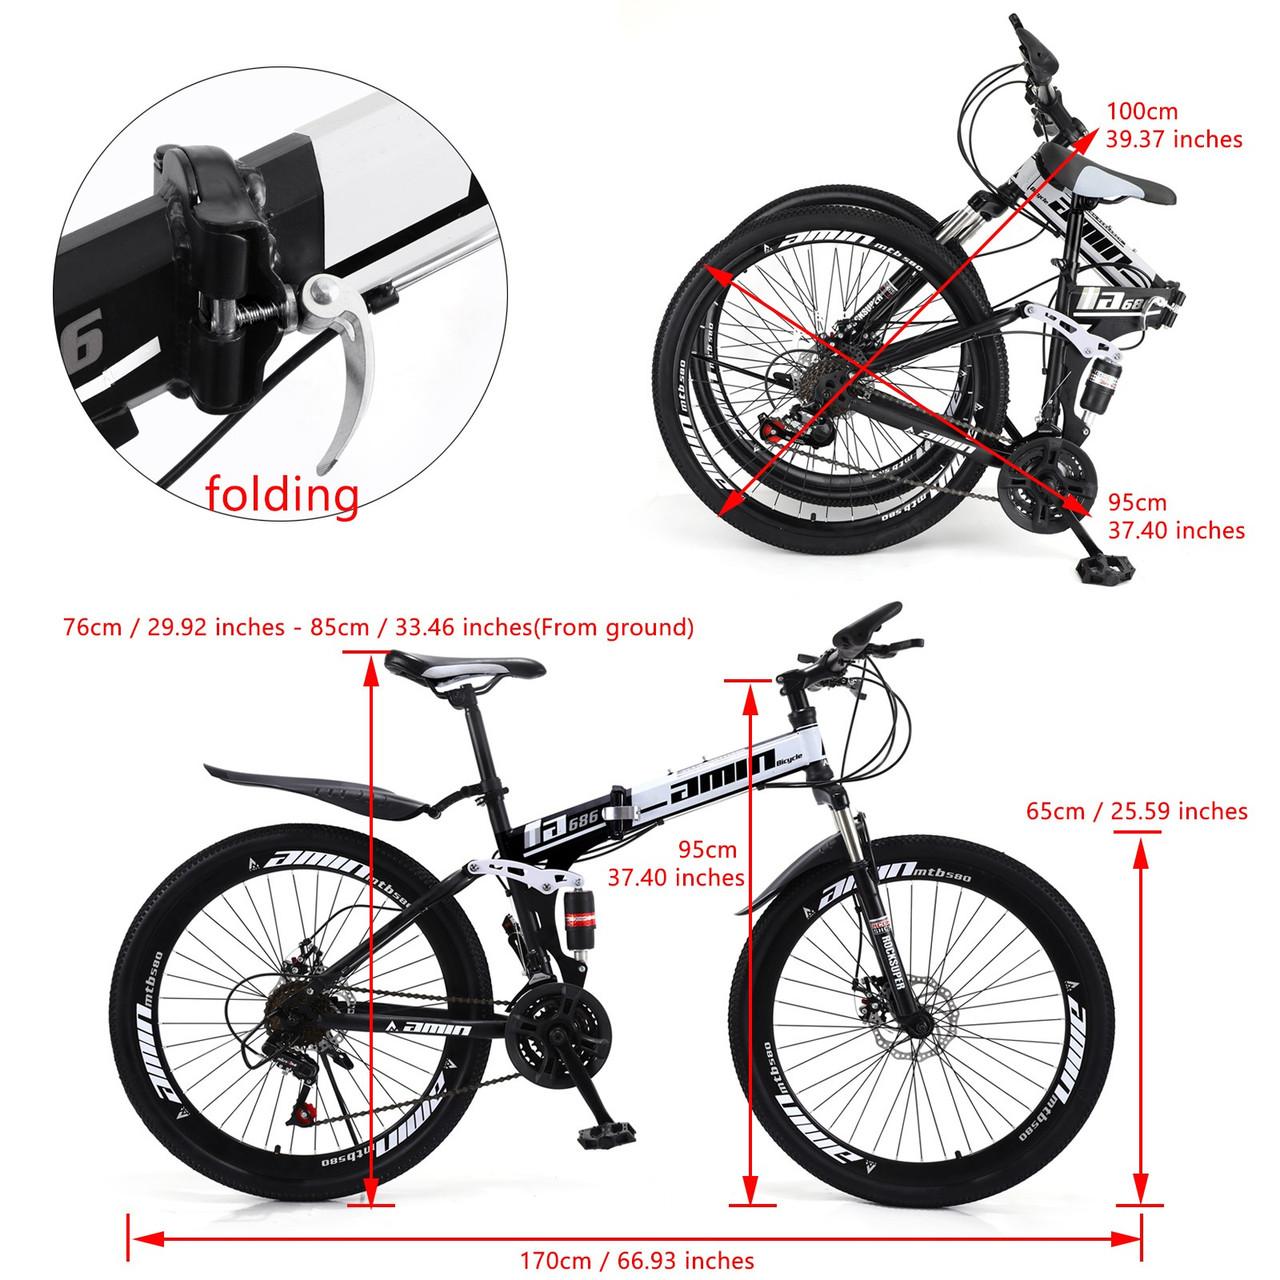 Adult 26 inch Folding Mountain Bike 21 Speed Bicycle Full suspension MTB White+Black